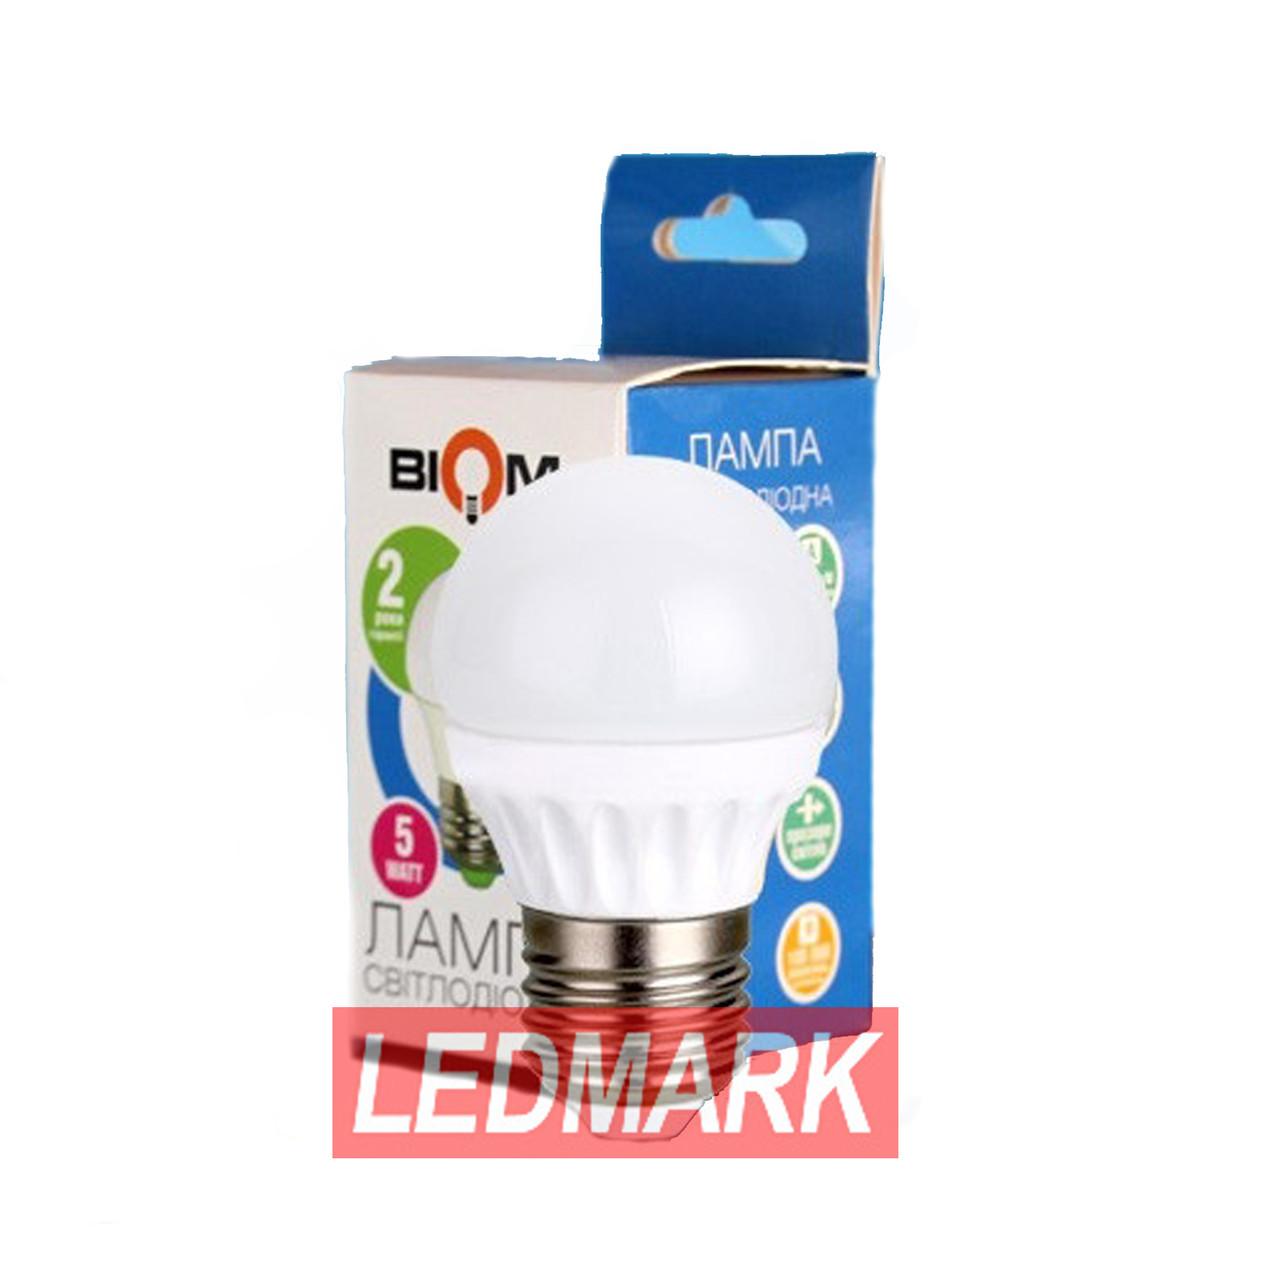 Лампа светодиодная BIOM BG-203 5W 3000K E27